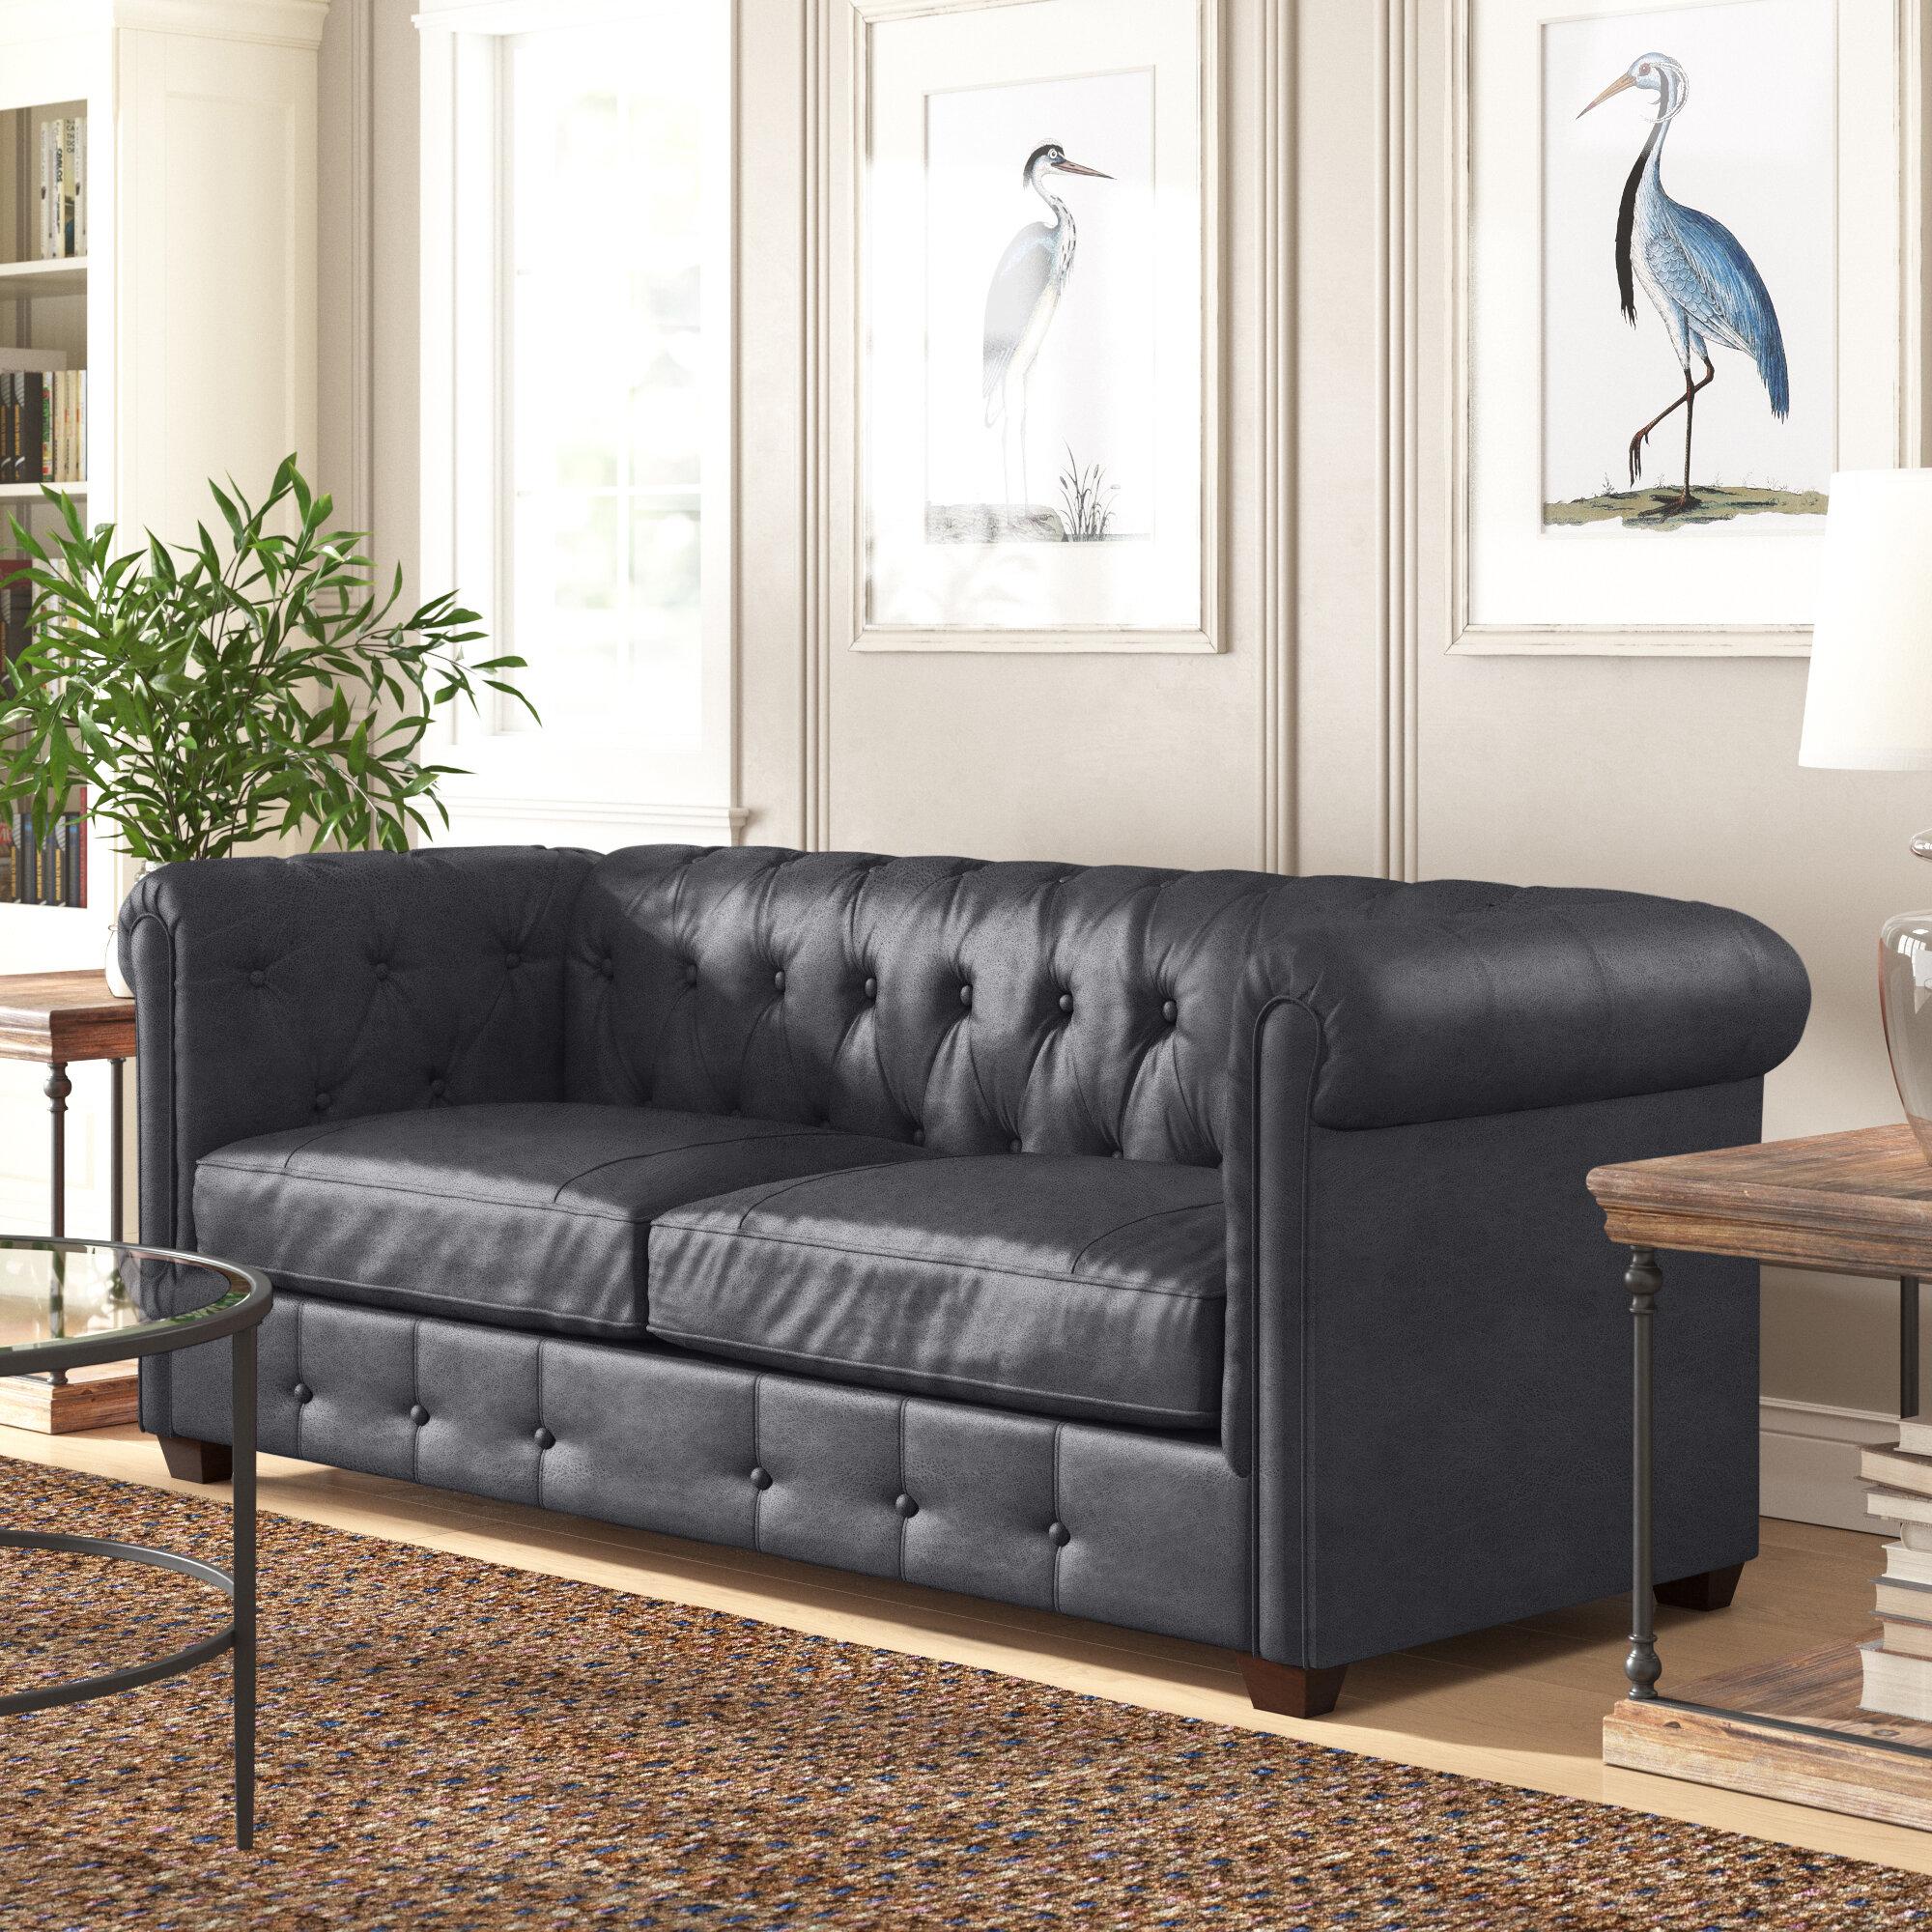 Birch Lane Hawthorn Genuine Leather Chesterfield 88 Rolled Arm Sofa Reviews Wayfair